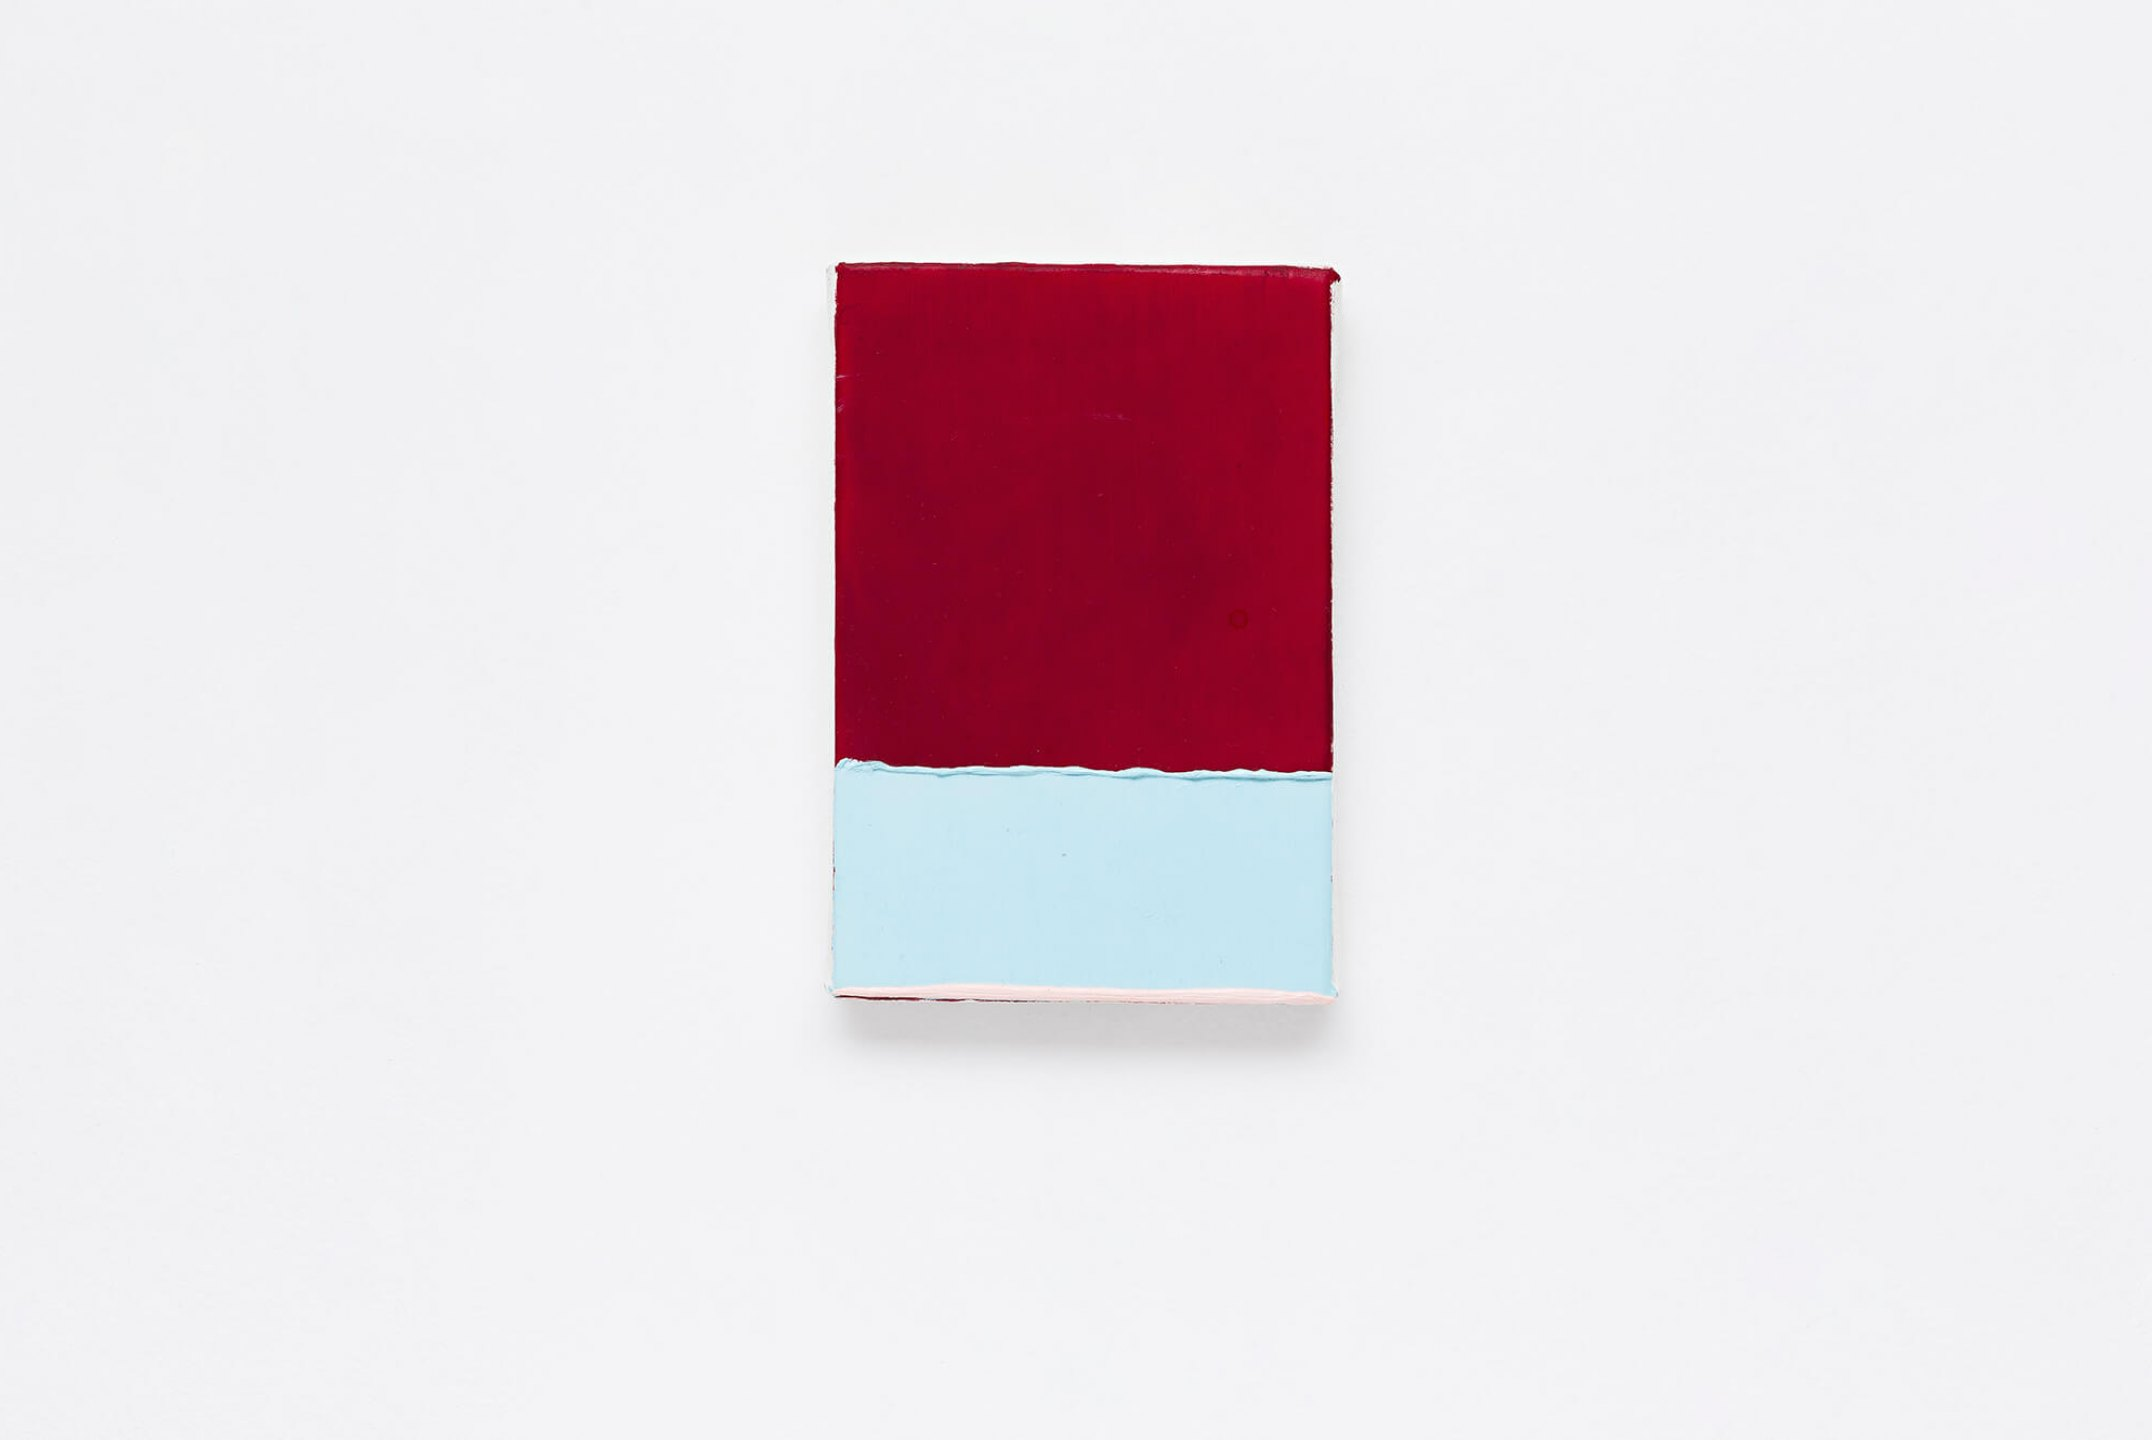 Paulo Monteiro,<em>untitled</em>, 2013, oil on linen, 15 × 10 cm - Mendes Wood DM